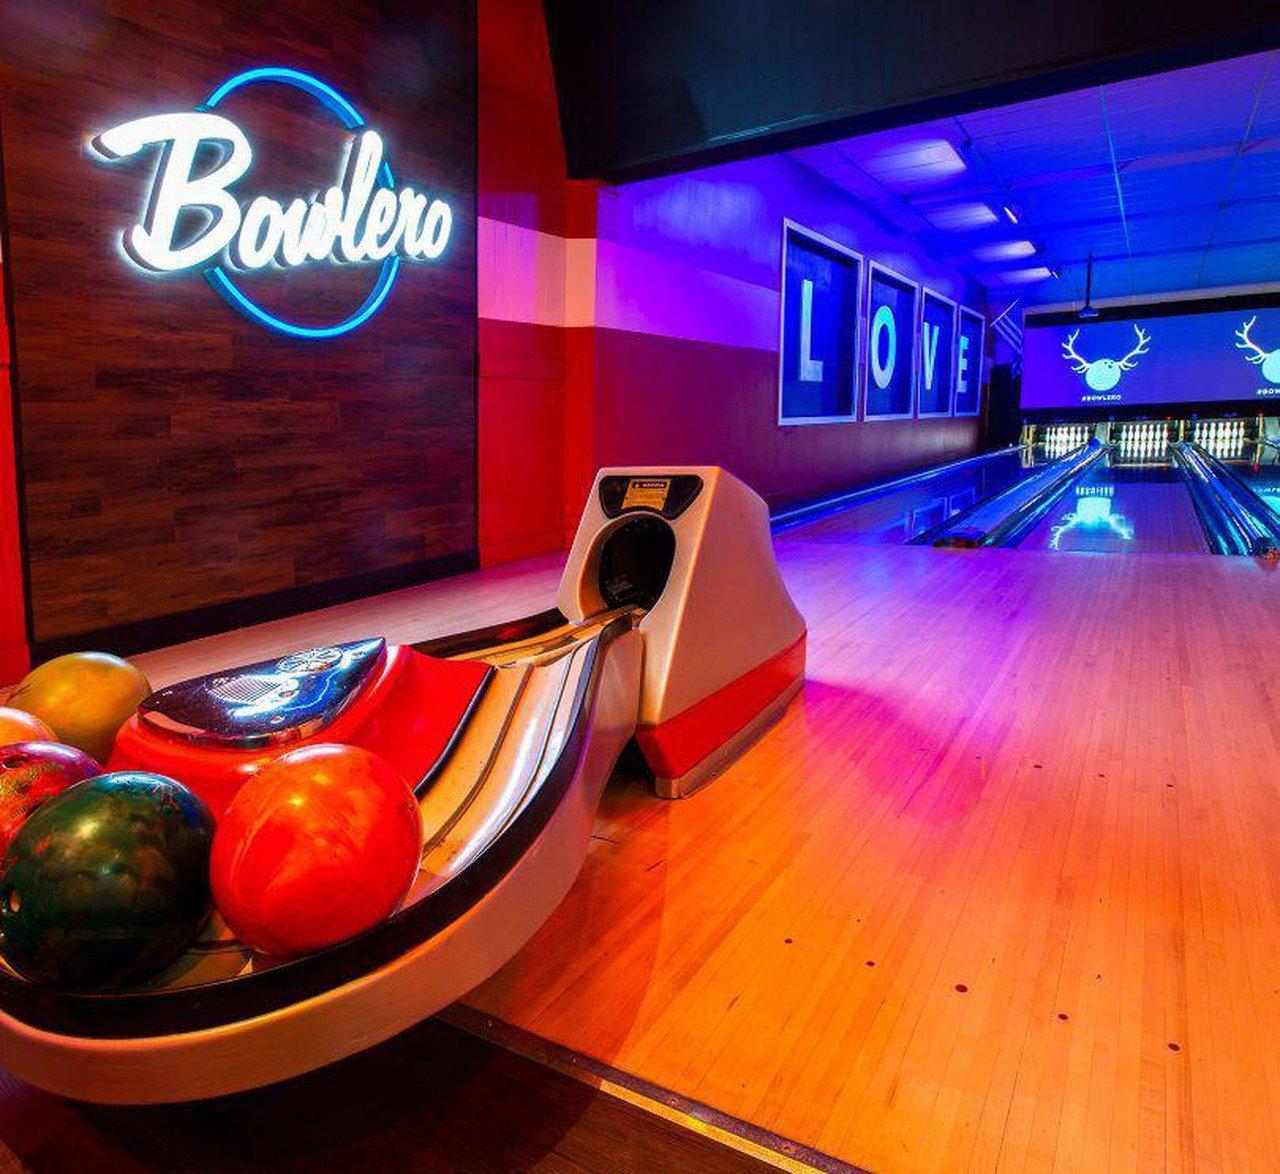 Rest der Welt corporate event venues Partyraum Bowlero -Clovis (Rodeo) #584(CA) image 0